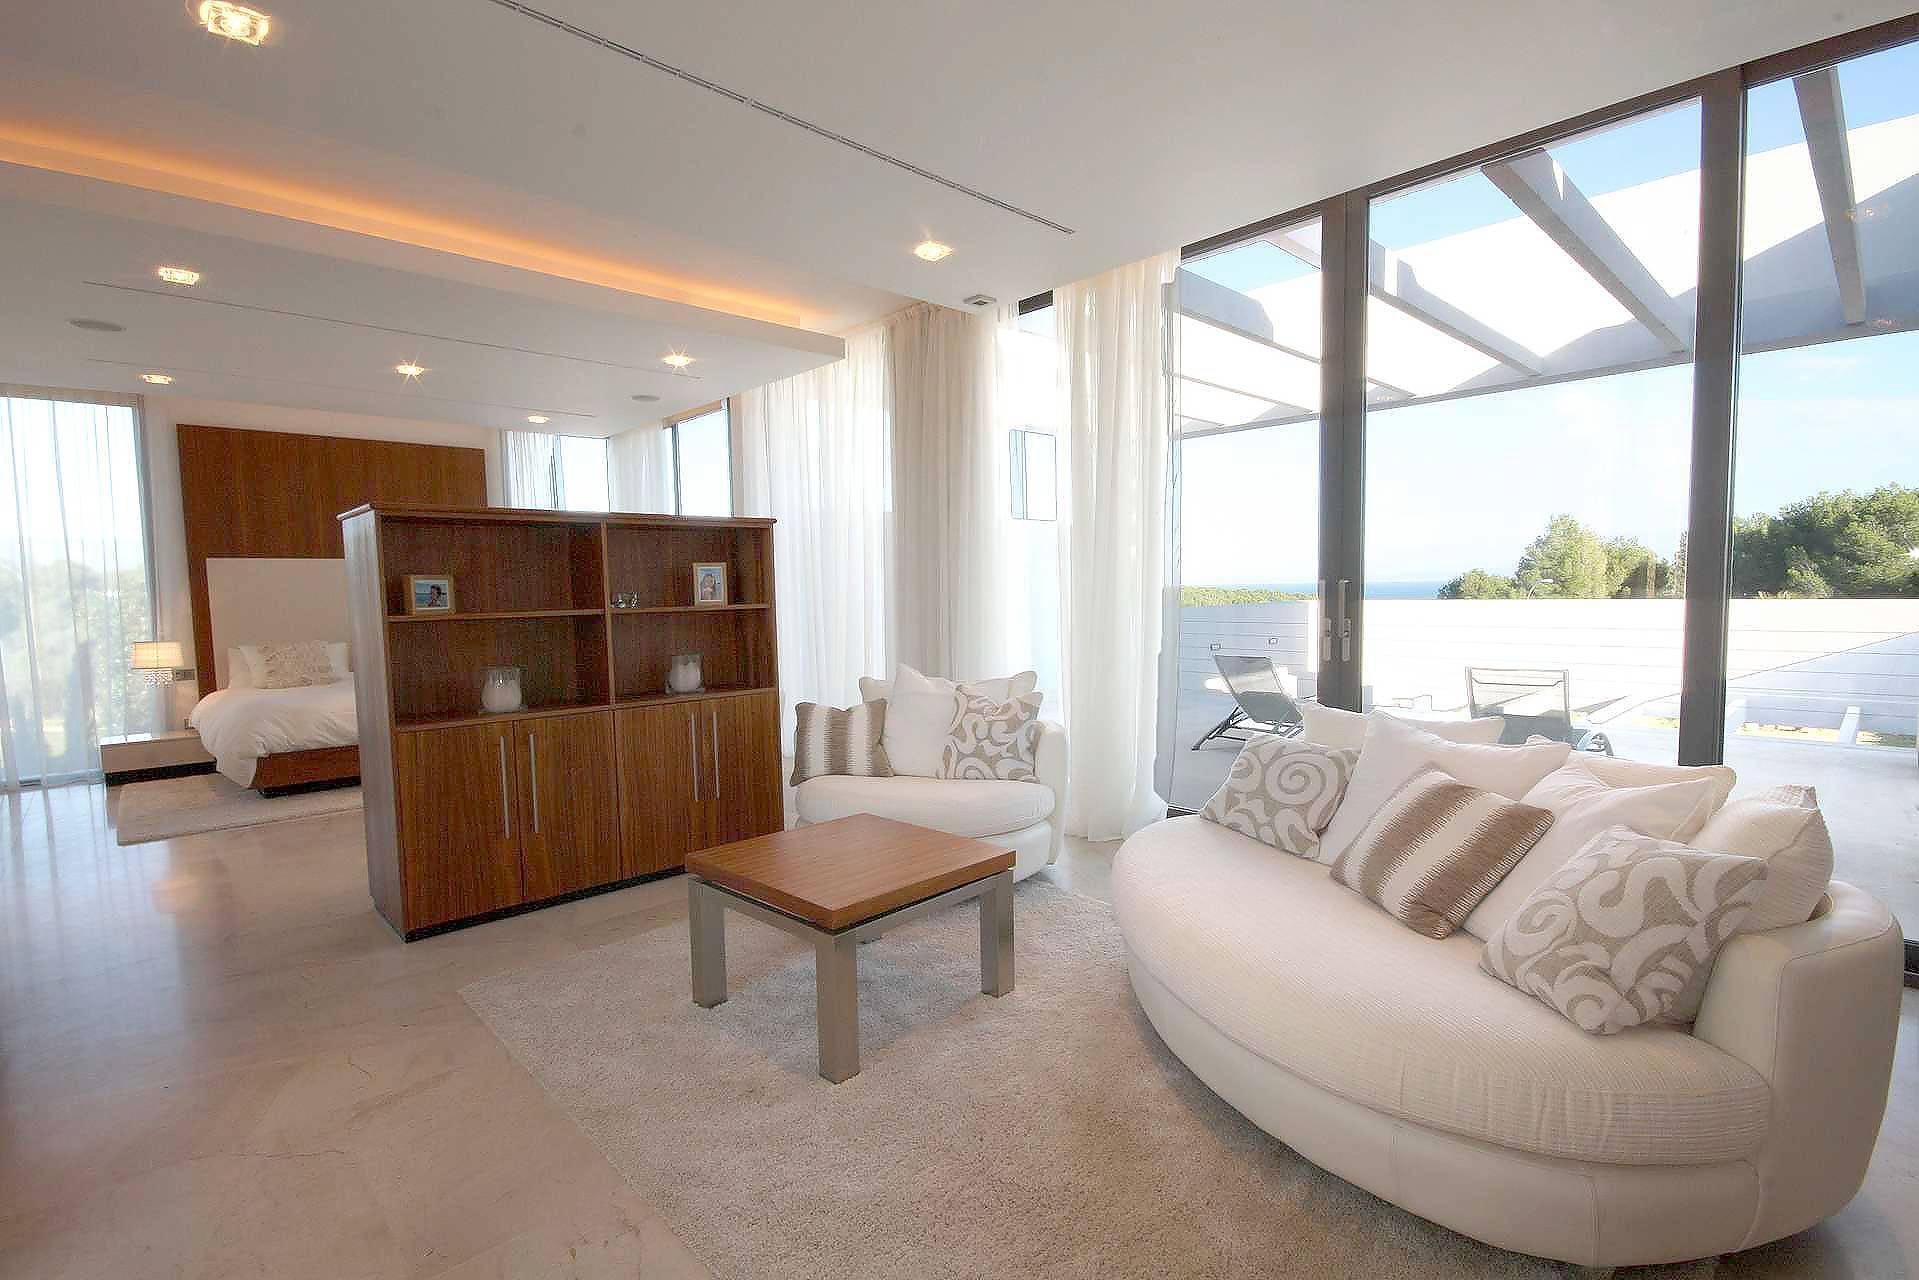 01-92 Design Villa Mallorca Südwesten Bild 37